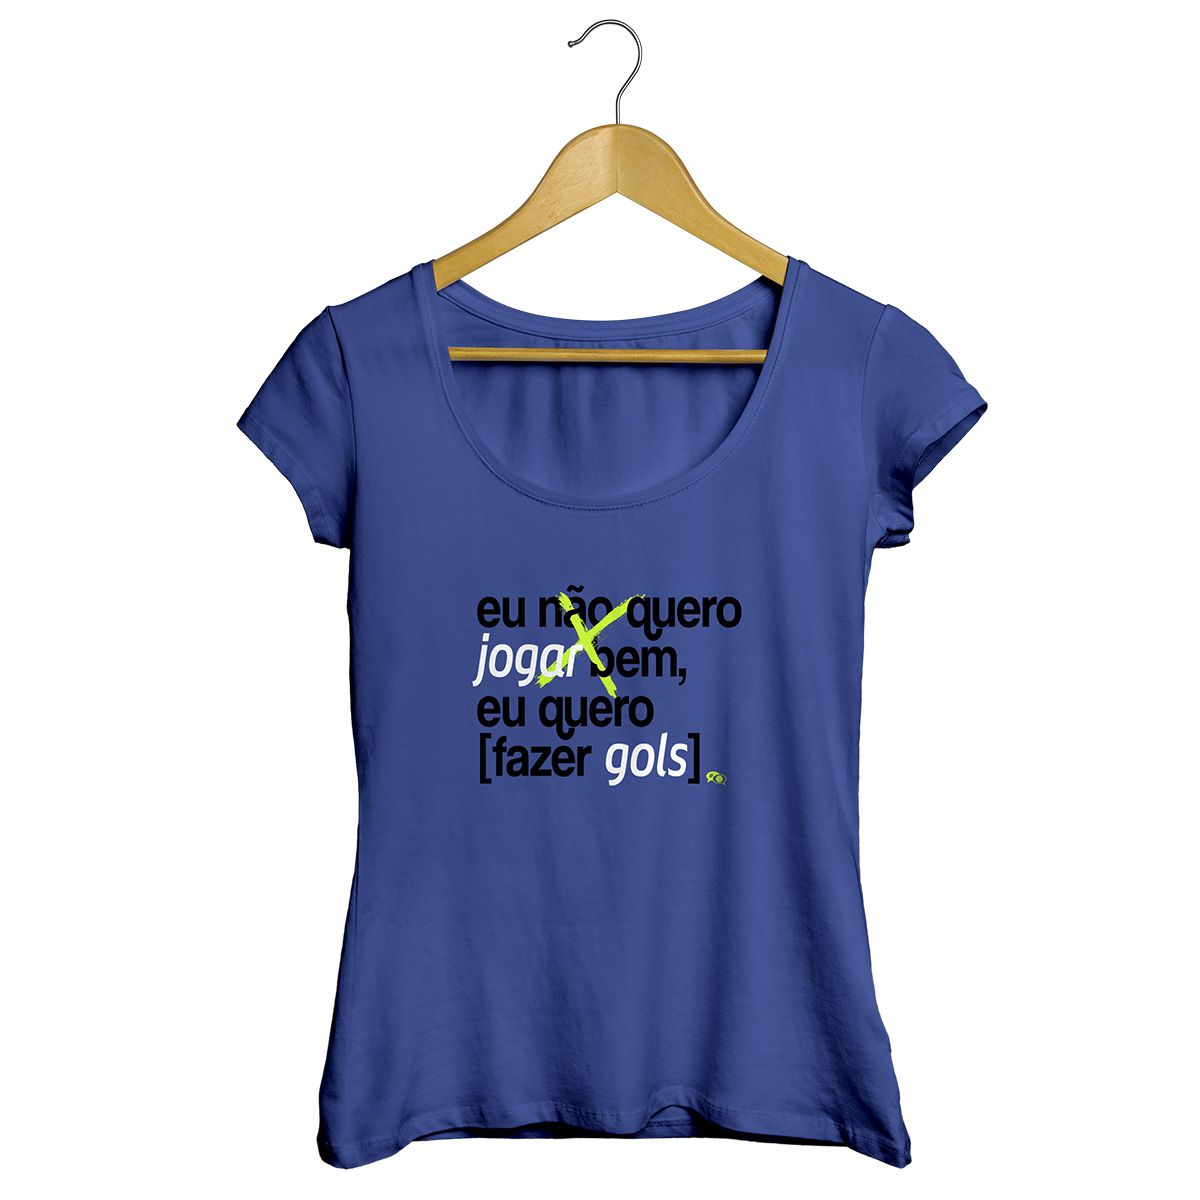 Camiseta - EU QUERO FAZER GOLS.  Feminina